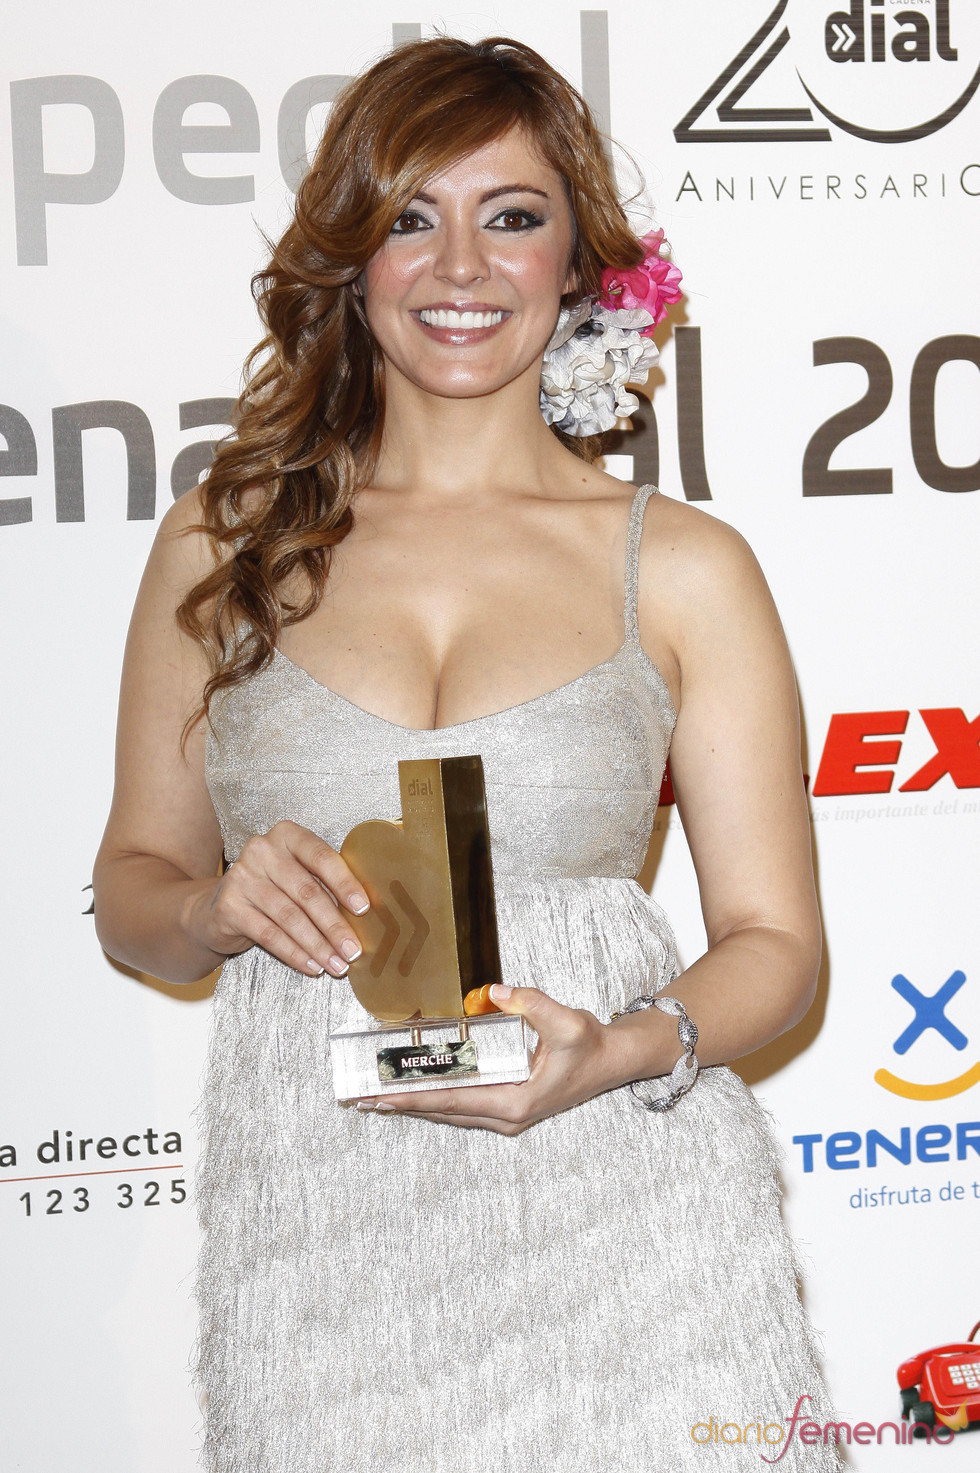 Jovencitas peruanass videos de actrices desnudas gratis 47